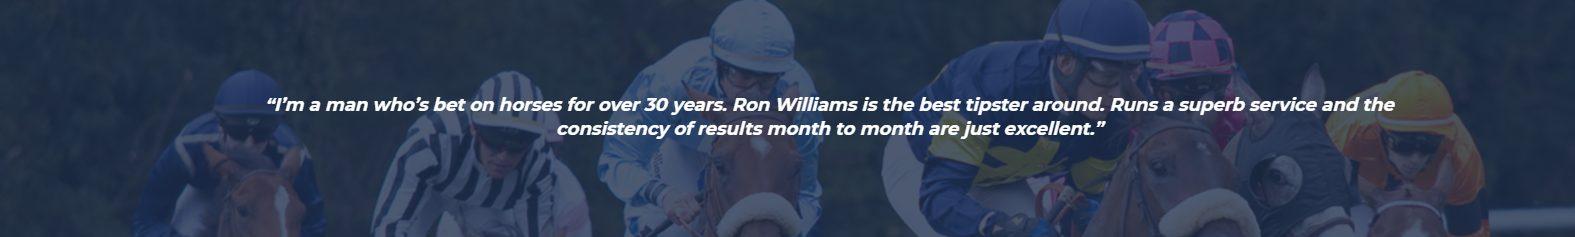 ron williams horse racing